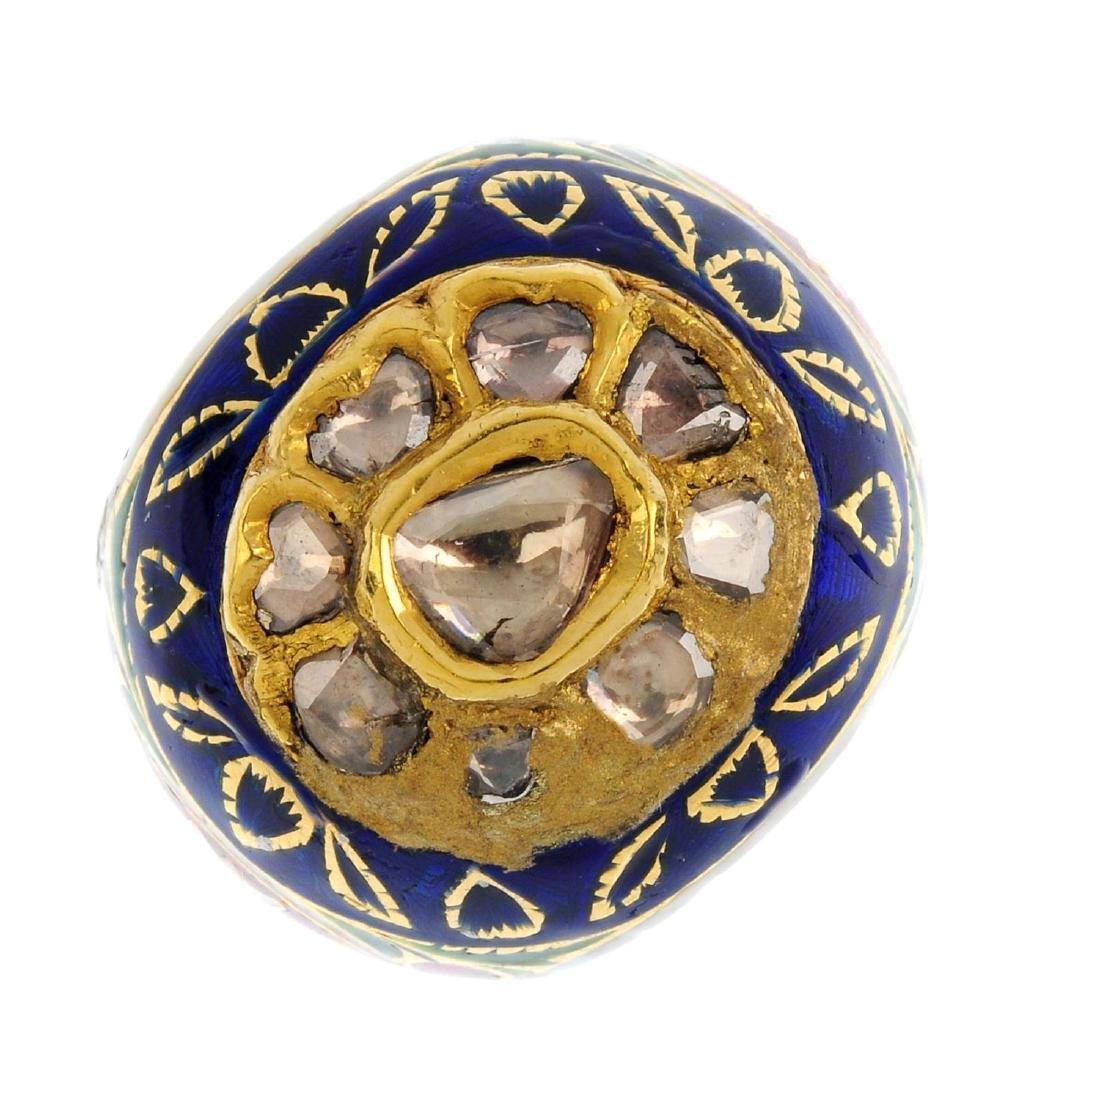 A diamond and enamel dress ring. The rose-cut diamond